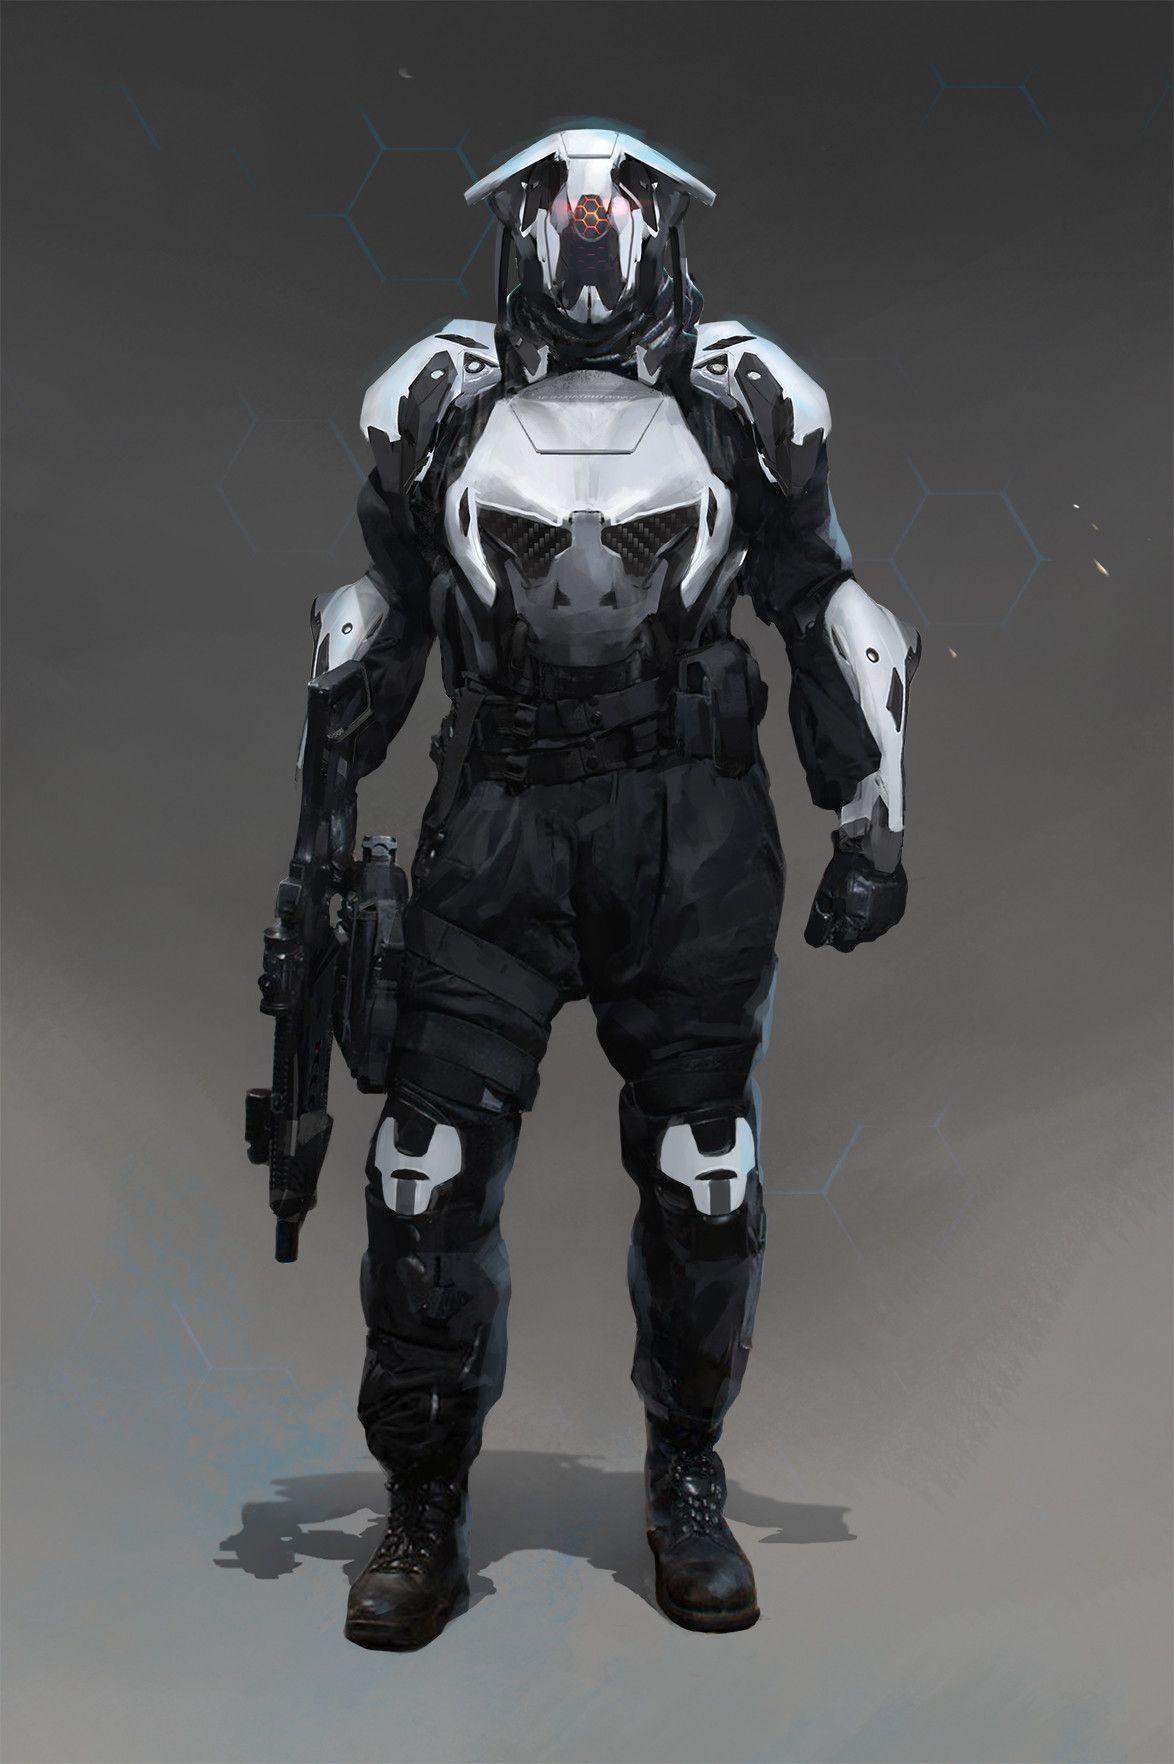 Armure Futuriste artstation - soldier, jacob savidan | costume/armure futuriste | jdr